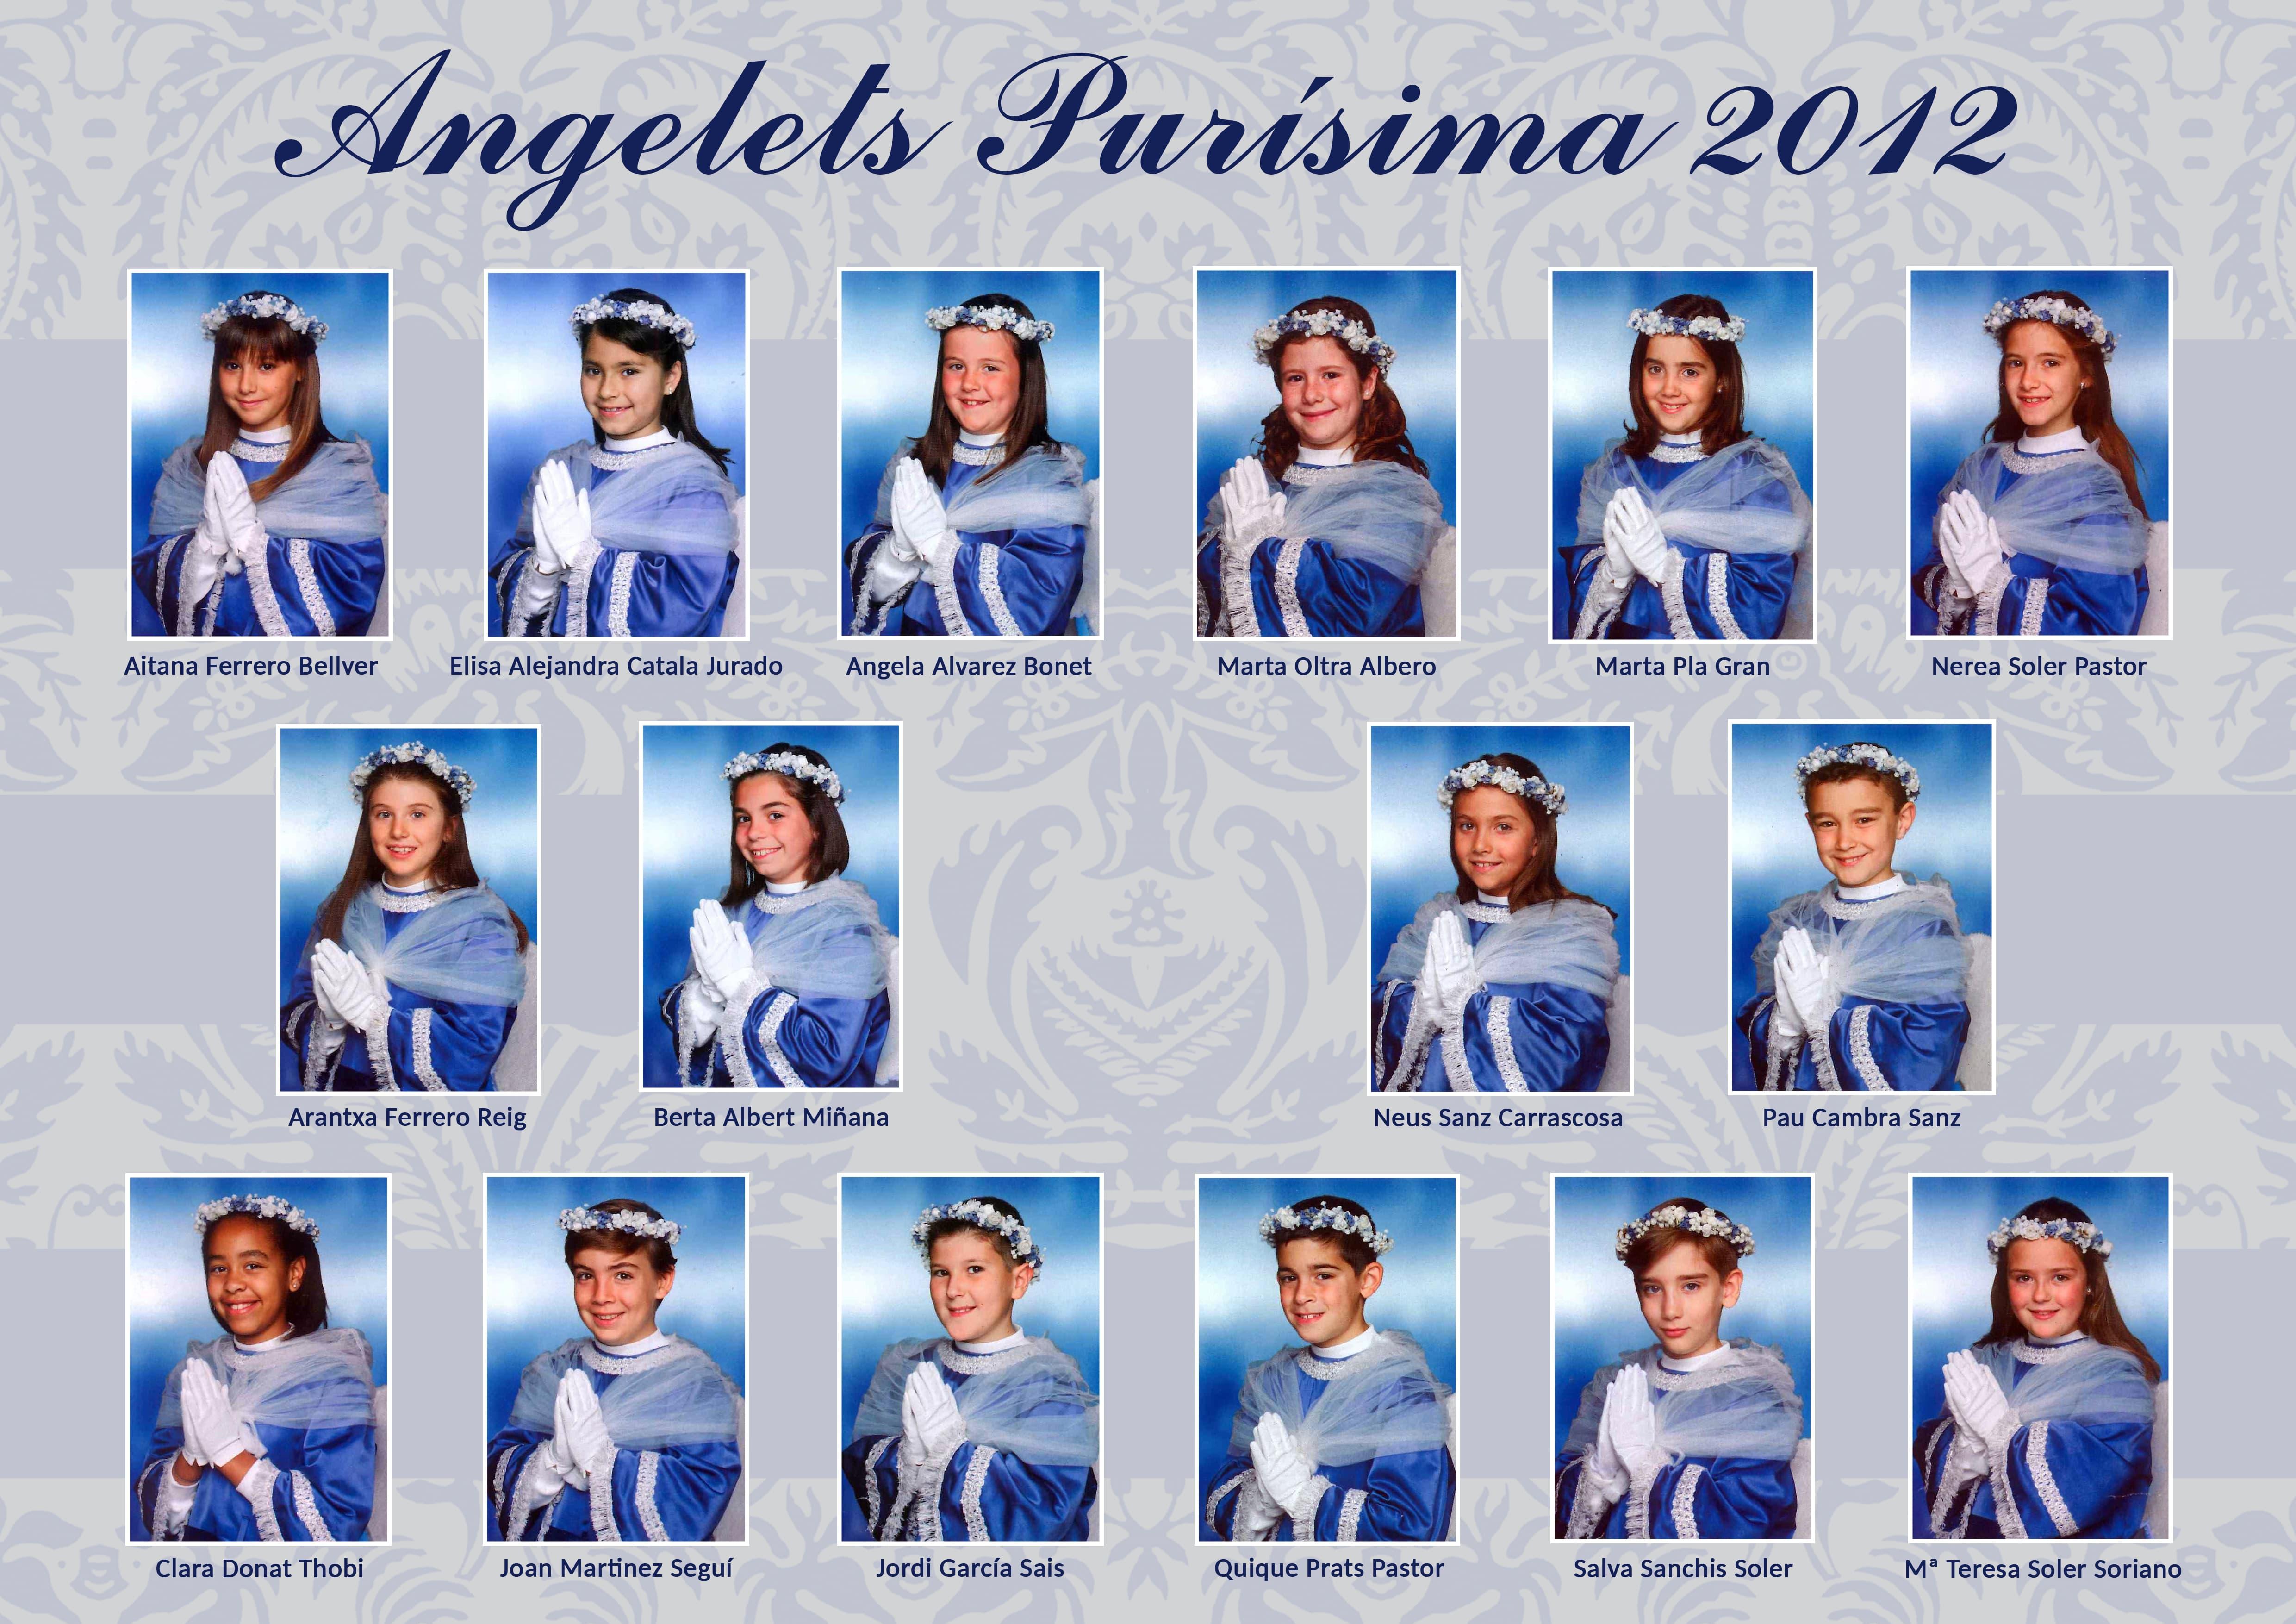 Angelets 2012